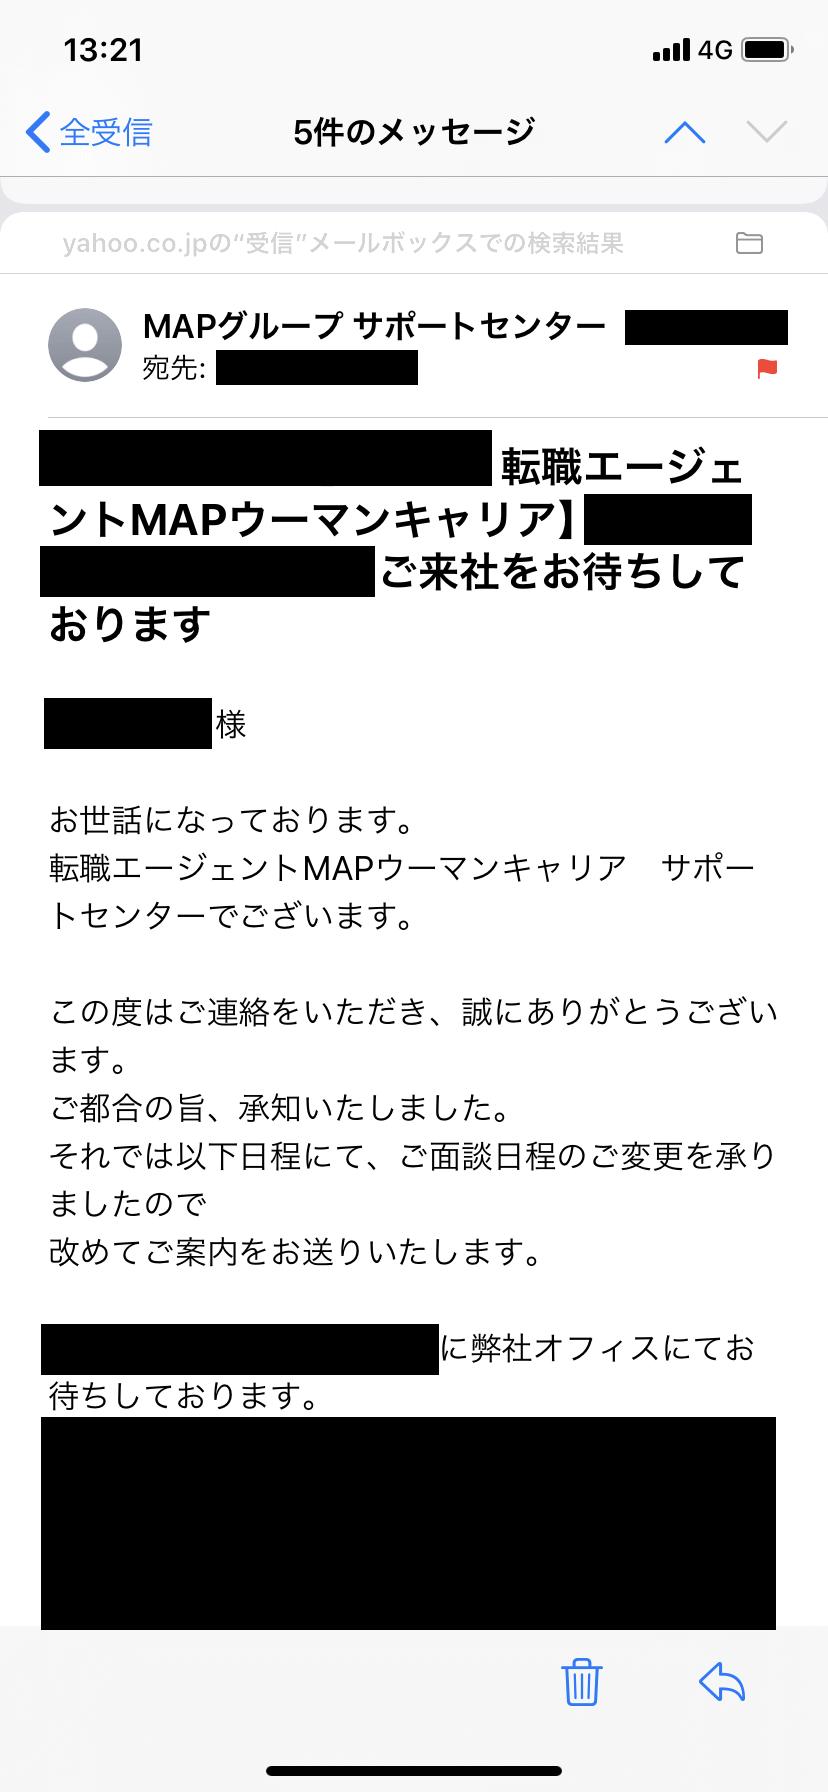 MAPウーマンキャリア 恵比寿本社